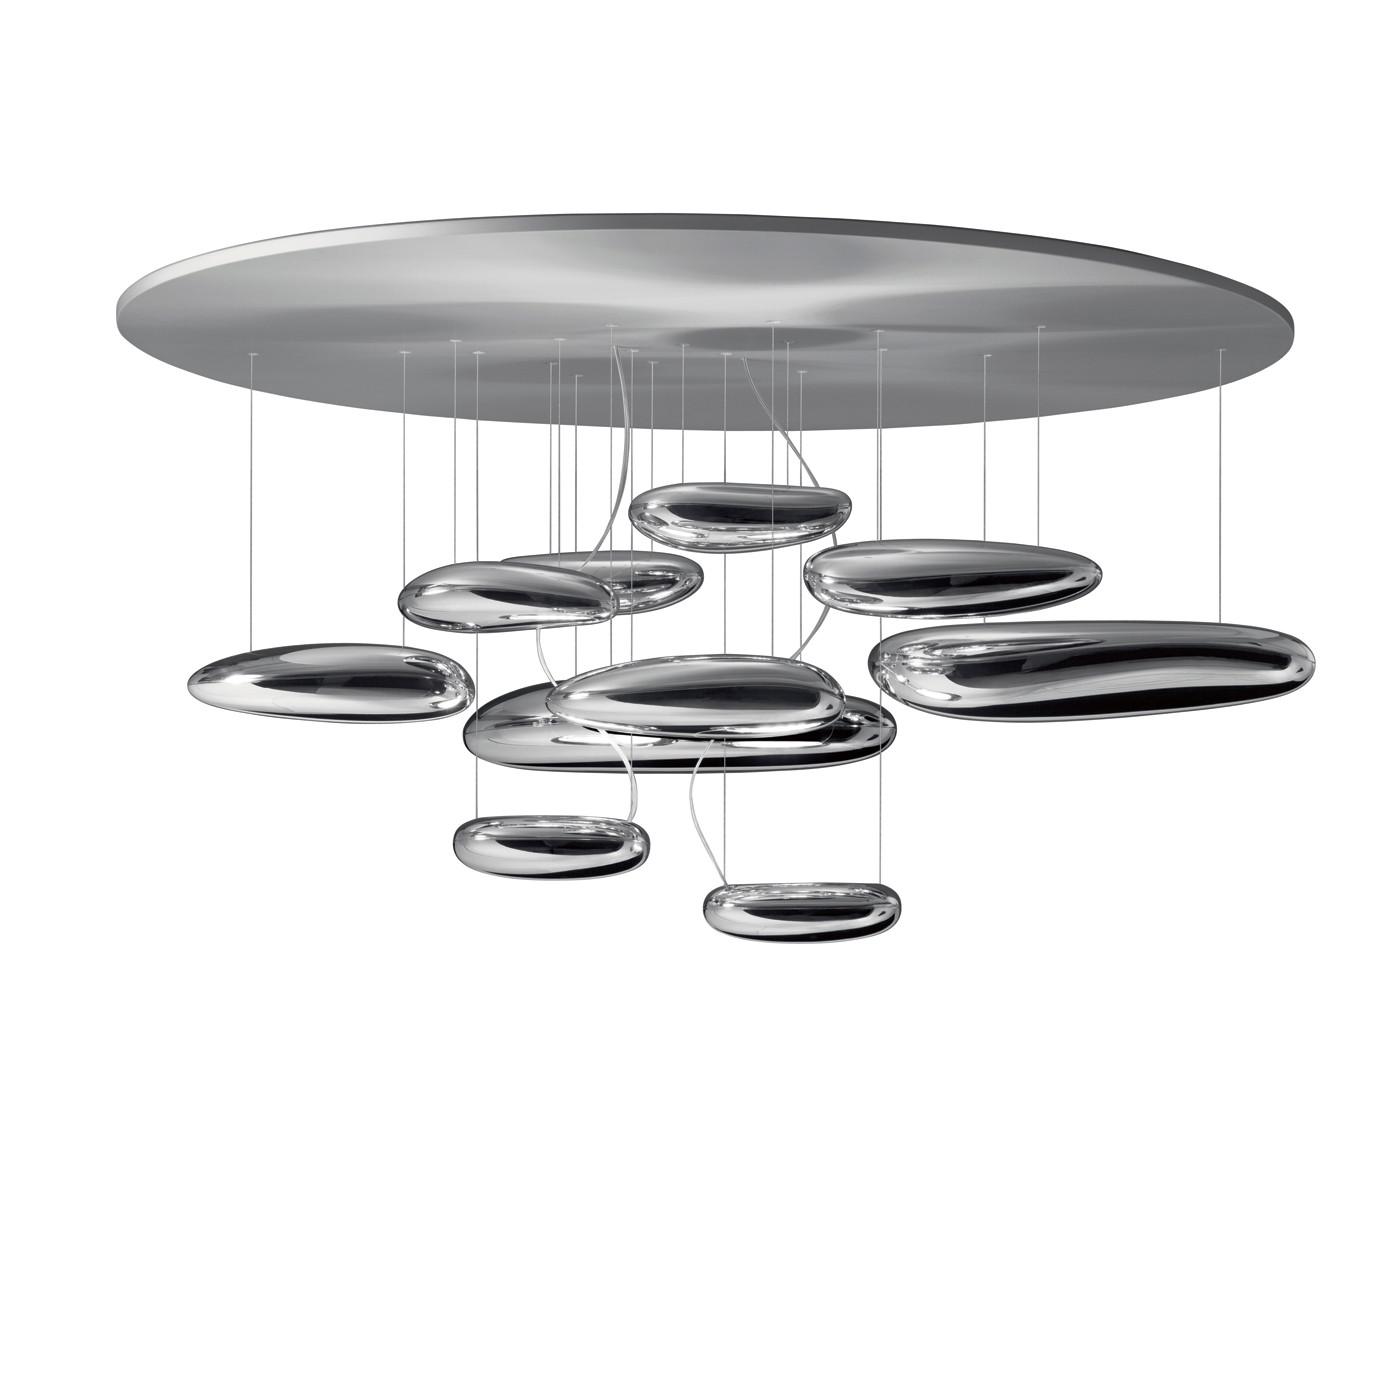 Artemide Mercury Soffitto LED